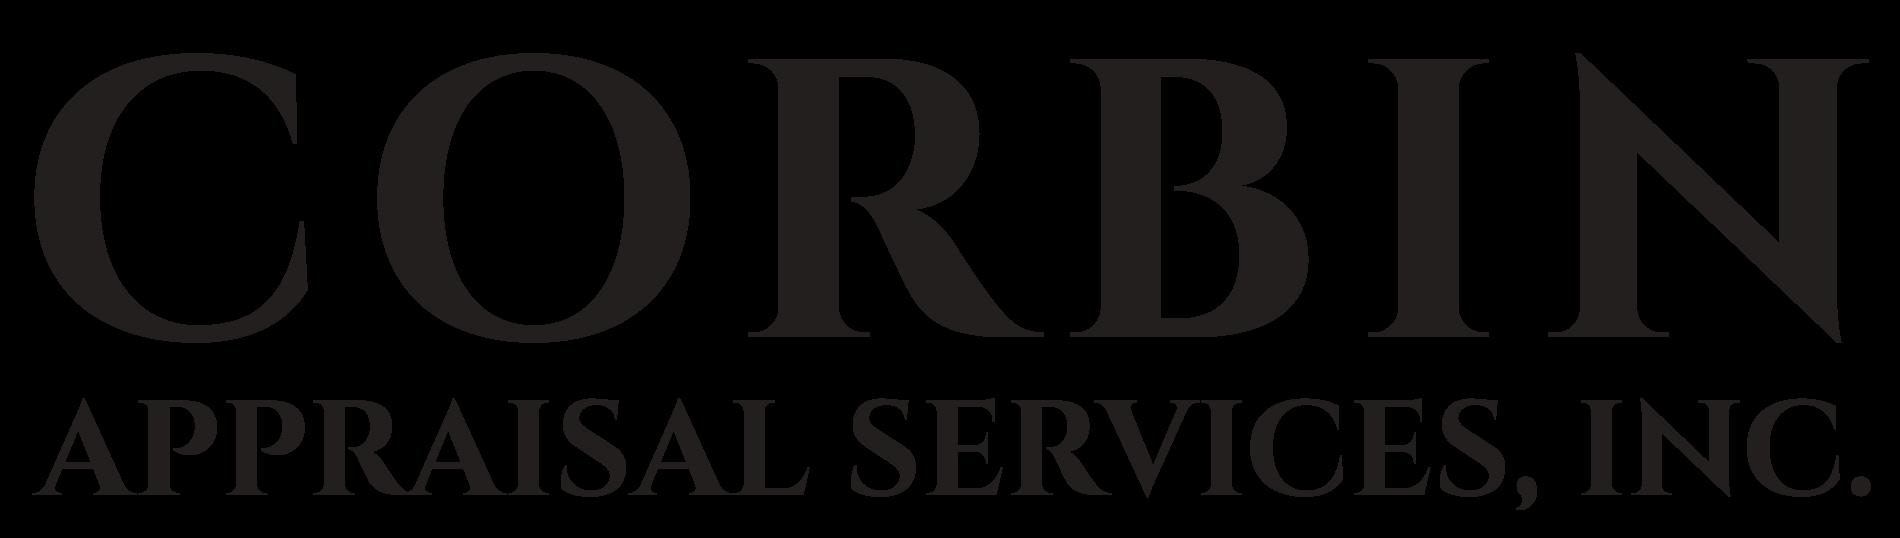 08115af7-20d5-445e-a9a5-f00dc2d9308739387249_Corbin-Appraisal-Services_FINAL